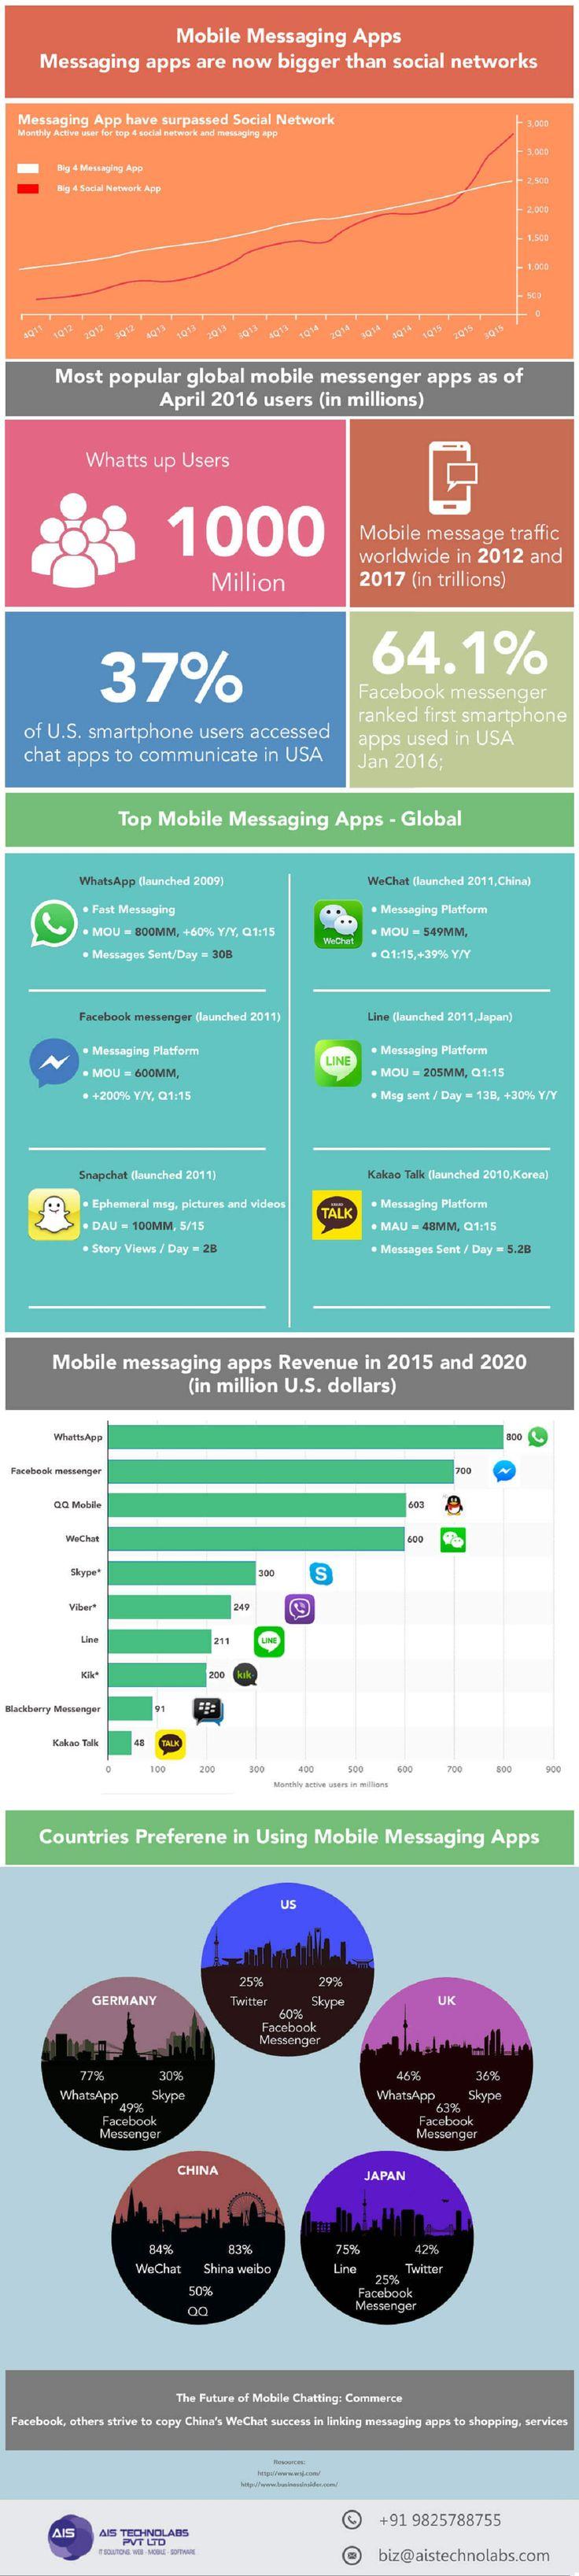 Top Mobile Messaging Apps